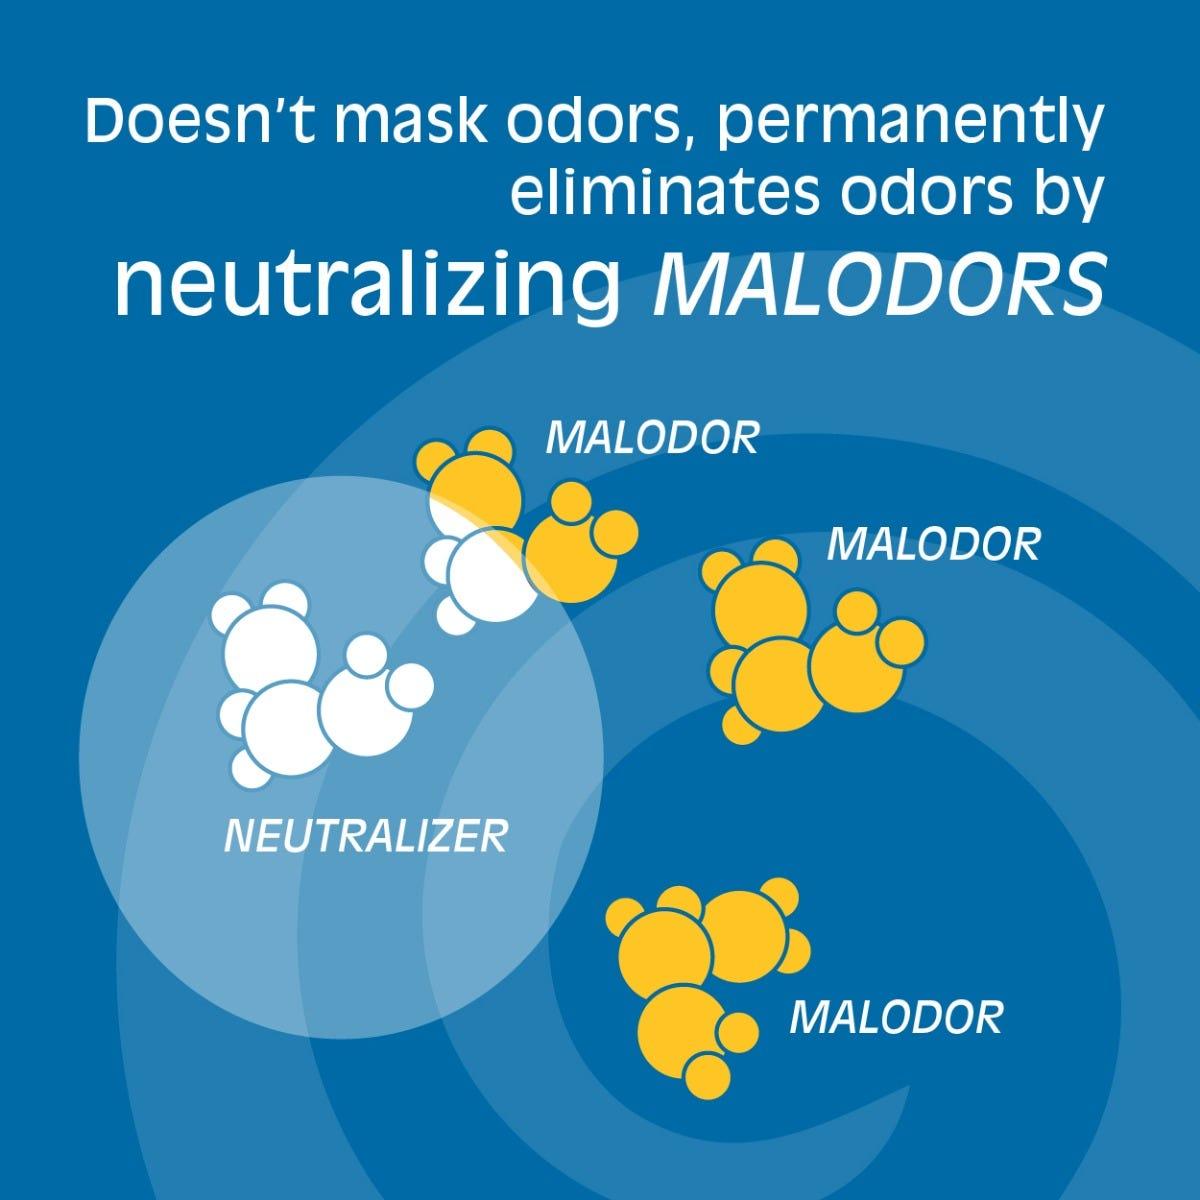 https://googone.com/media/catalog/product/l/a/lavender_odor_absorber_malorders_2_1.jpg